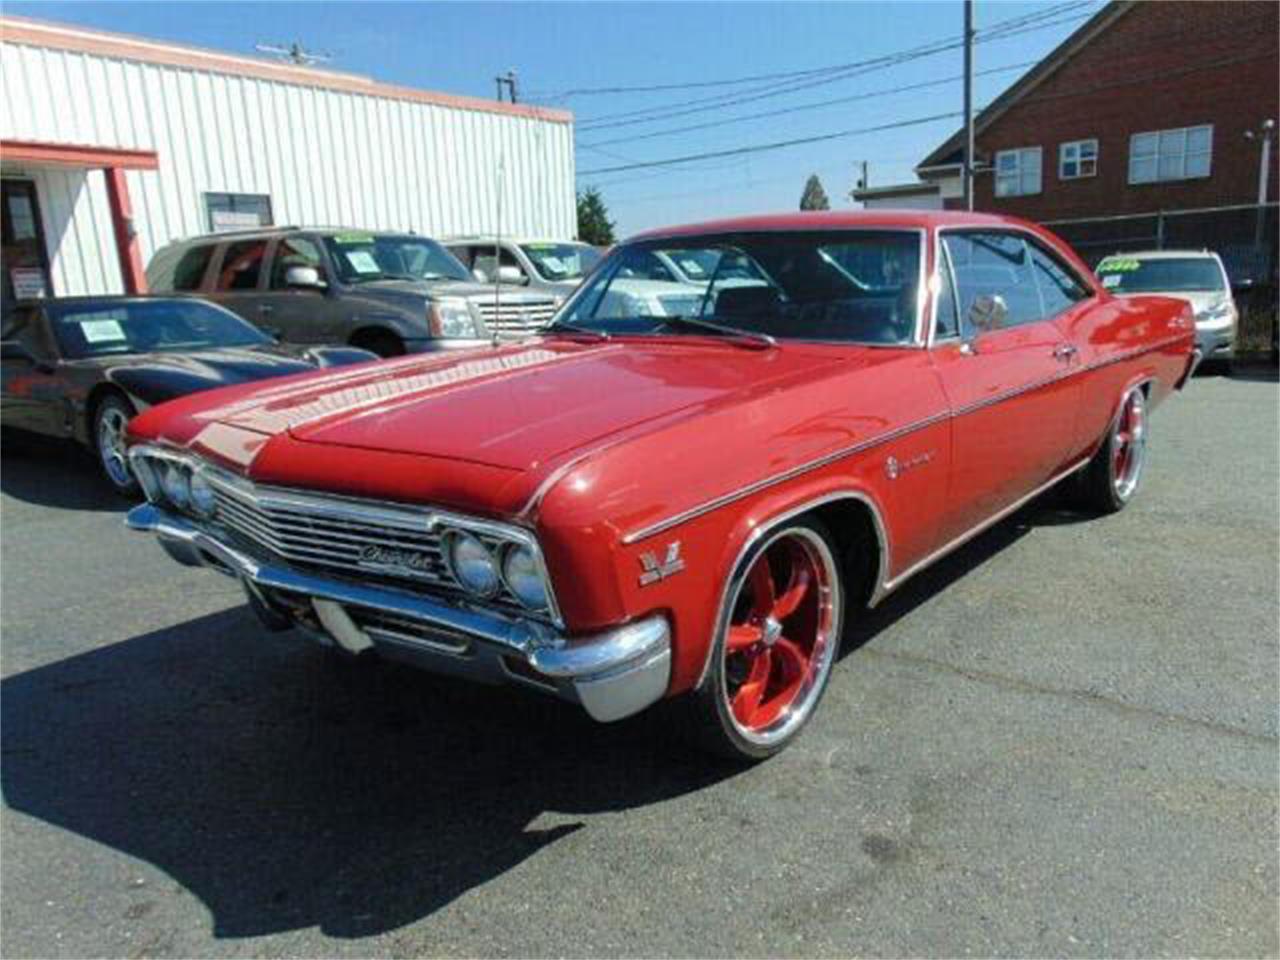 For Sale: 1966 Chevrolet Impala in Tacoma, Washington